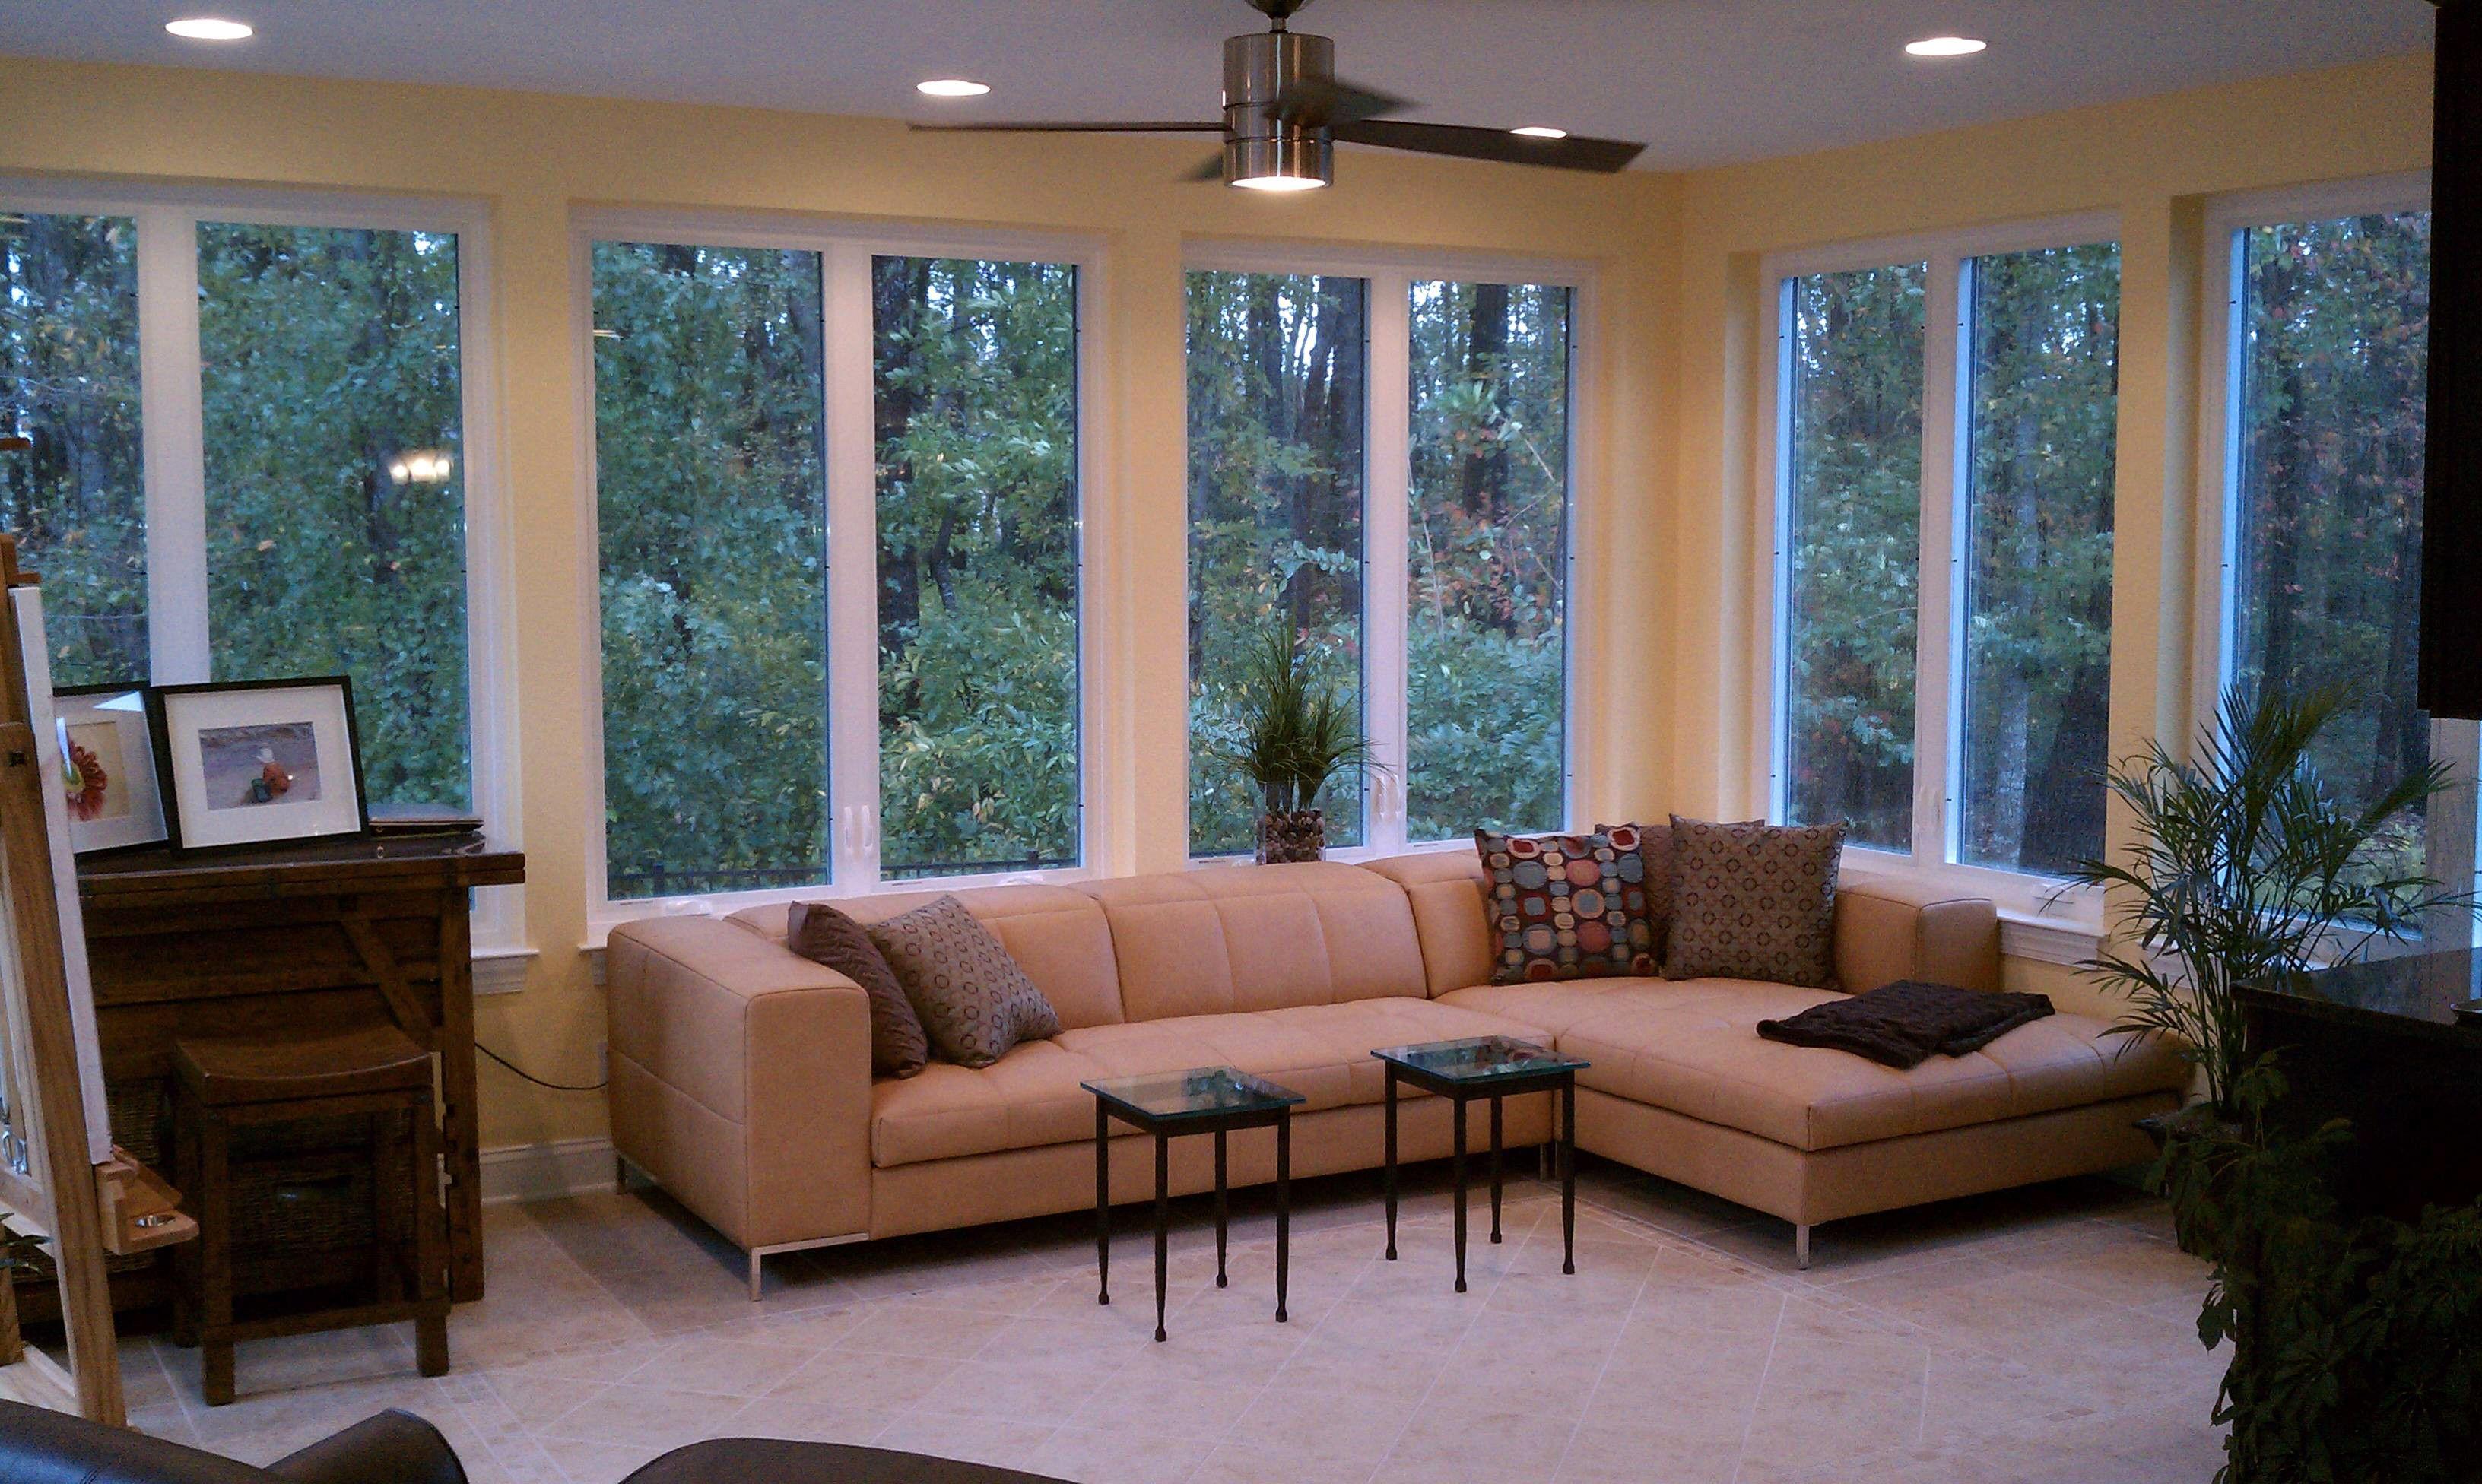 Beautiful Chic Sunroom Design Ideas Equipped Cheap ... on Cheap Patio Enclosure Ideas  id=54152